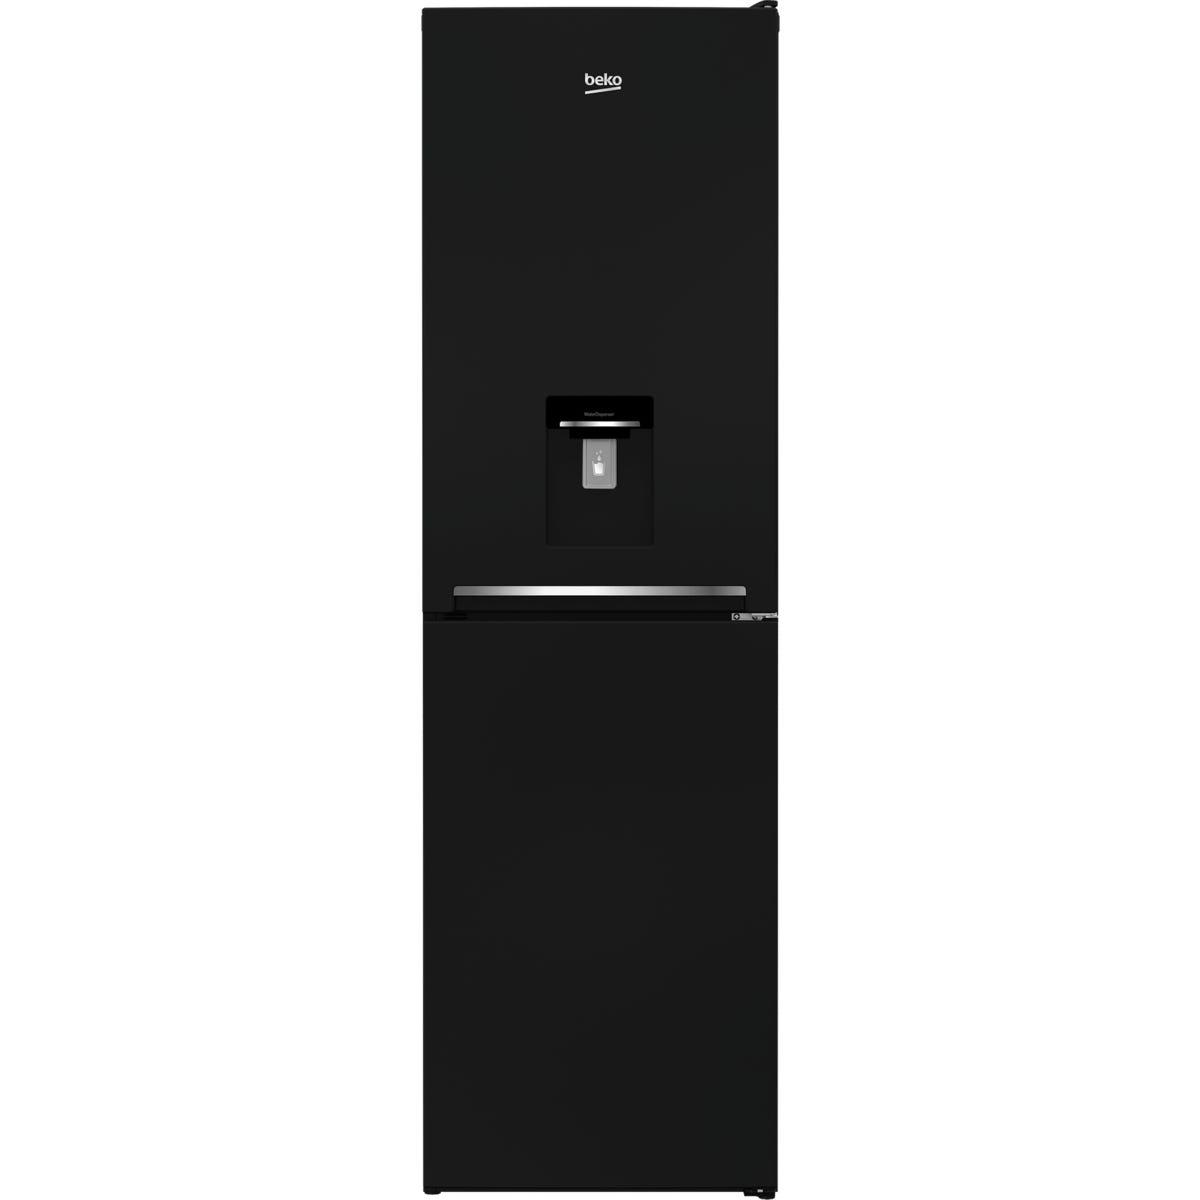 Beko CFG3582DB 263L Frost Free Combi Fridge Freezer with Water Dispenser - Black